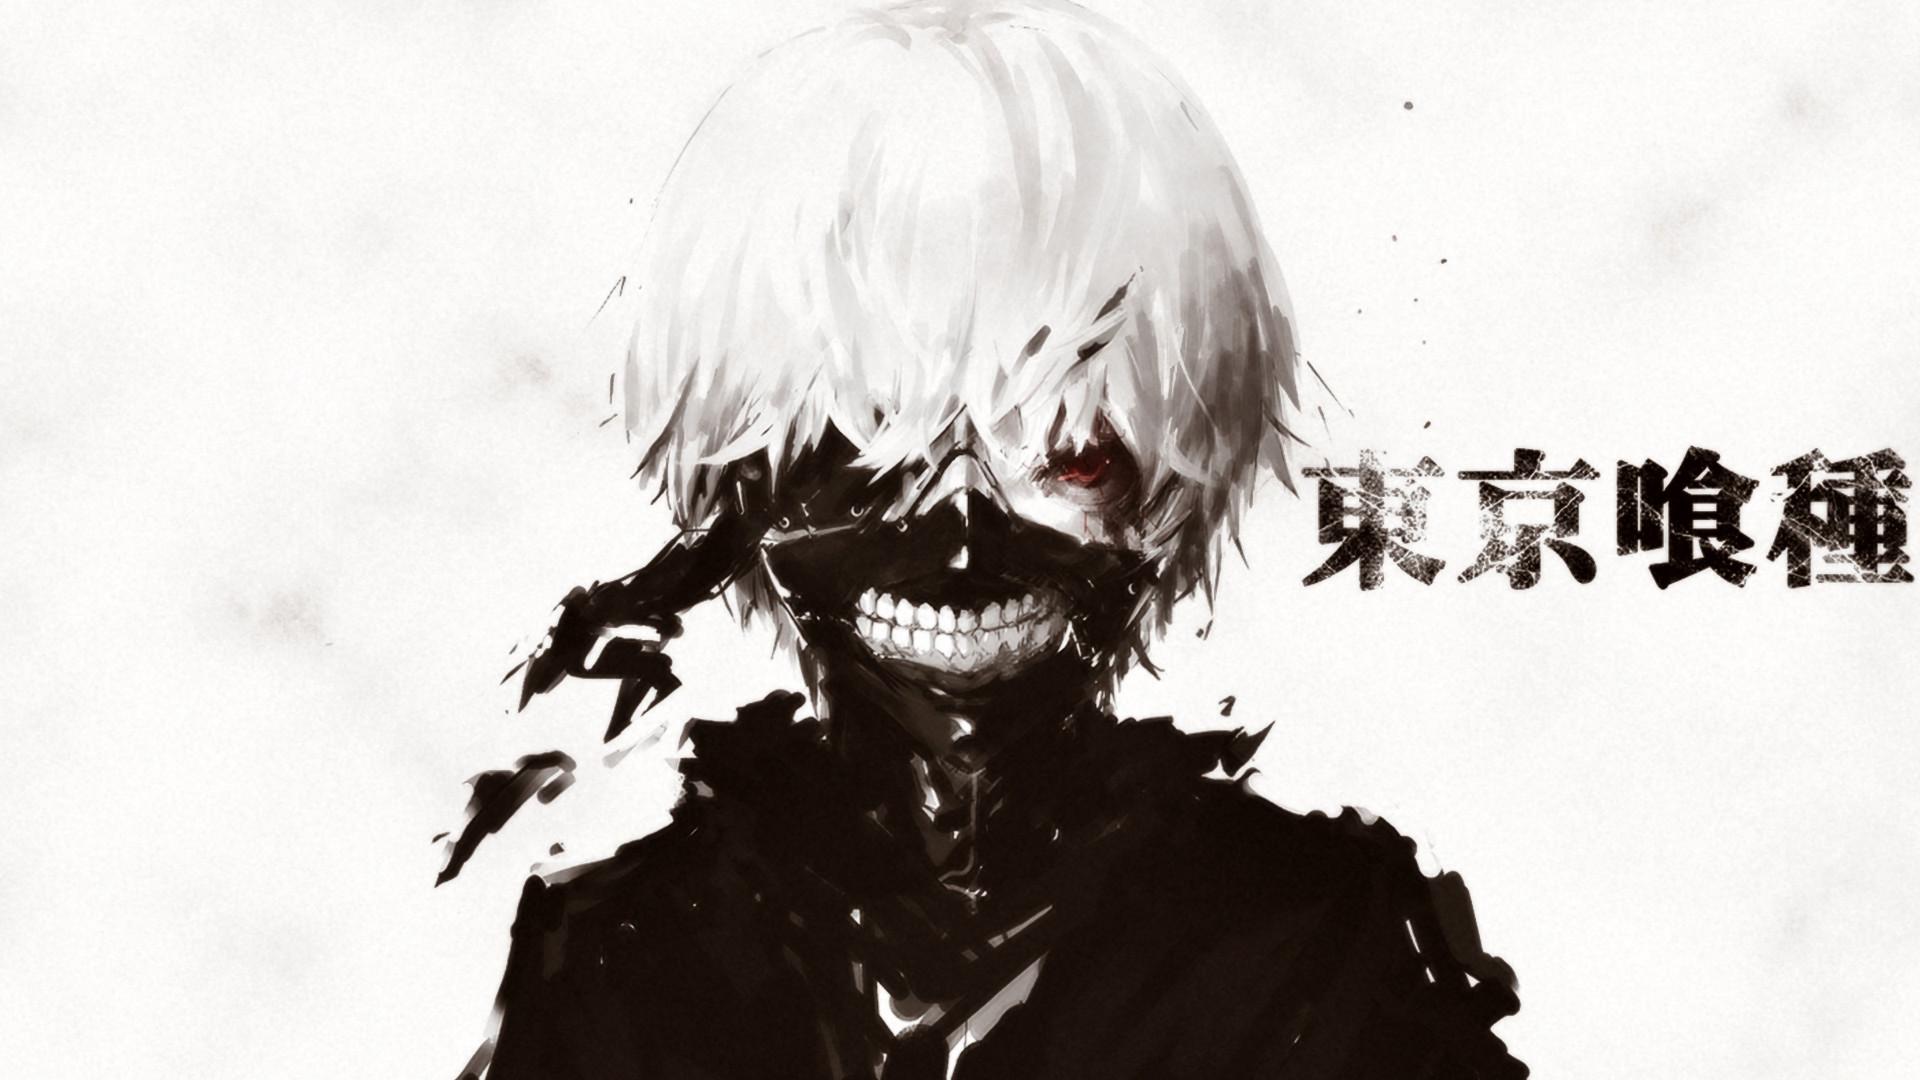 Hd wallpaper tokyo ghoul - 1920x1080 Hd Wallpaper Hintergrund Id 526888 1920x1080 Anime Tokyo Ghoul